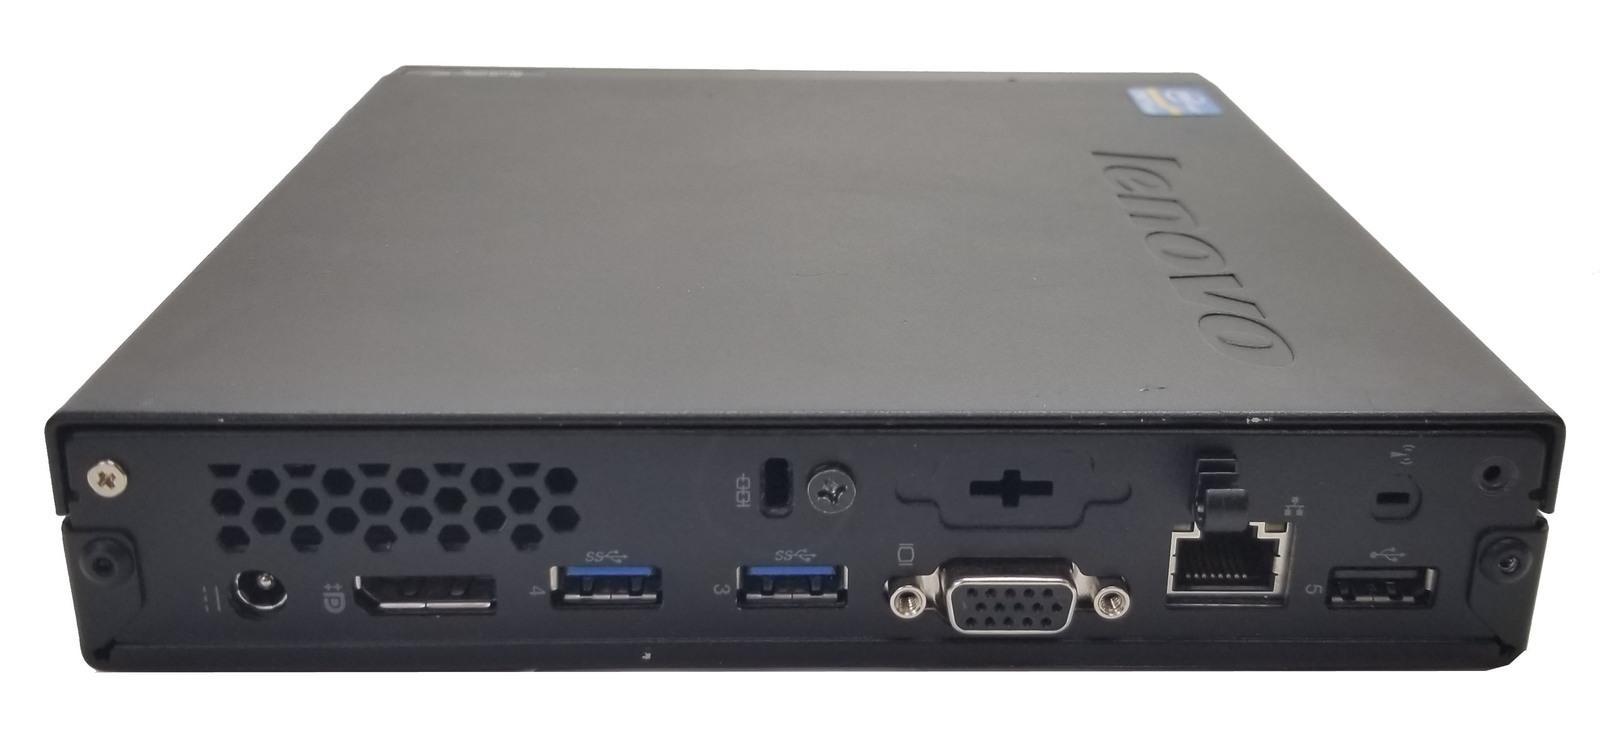 Lenovo ThinkCentre M92p i5-3470T Compact Powerhouse (3238B5U) Bin:SF